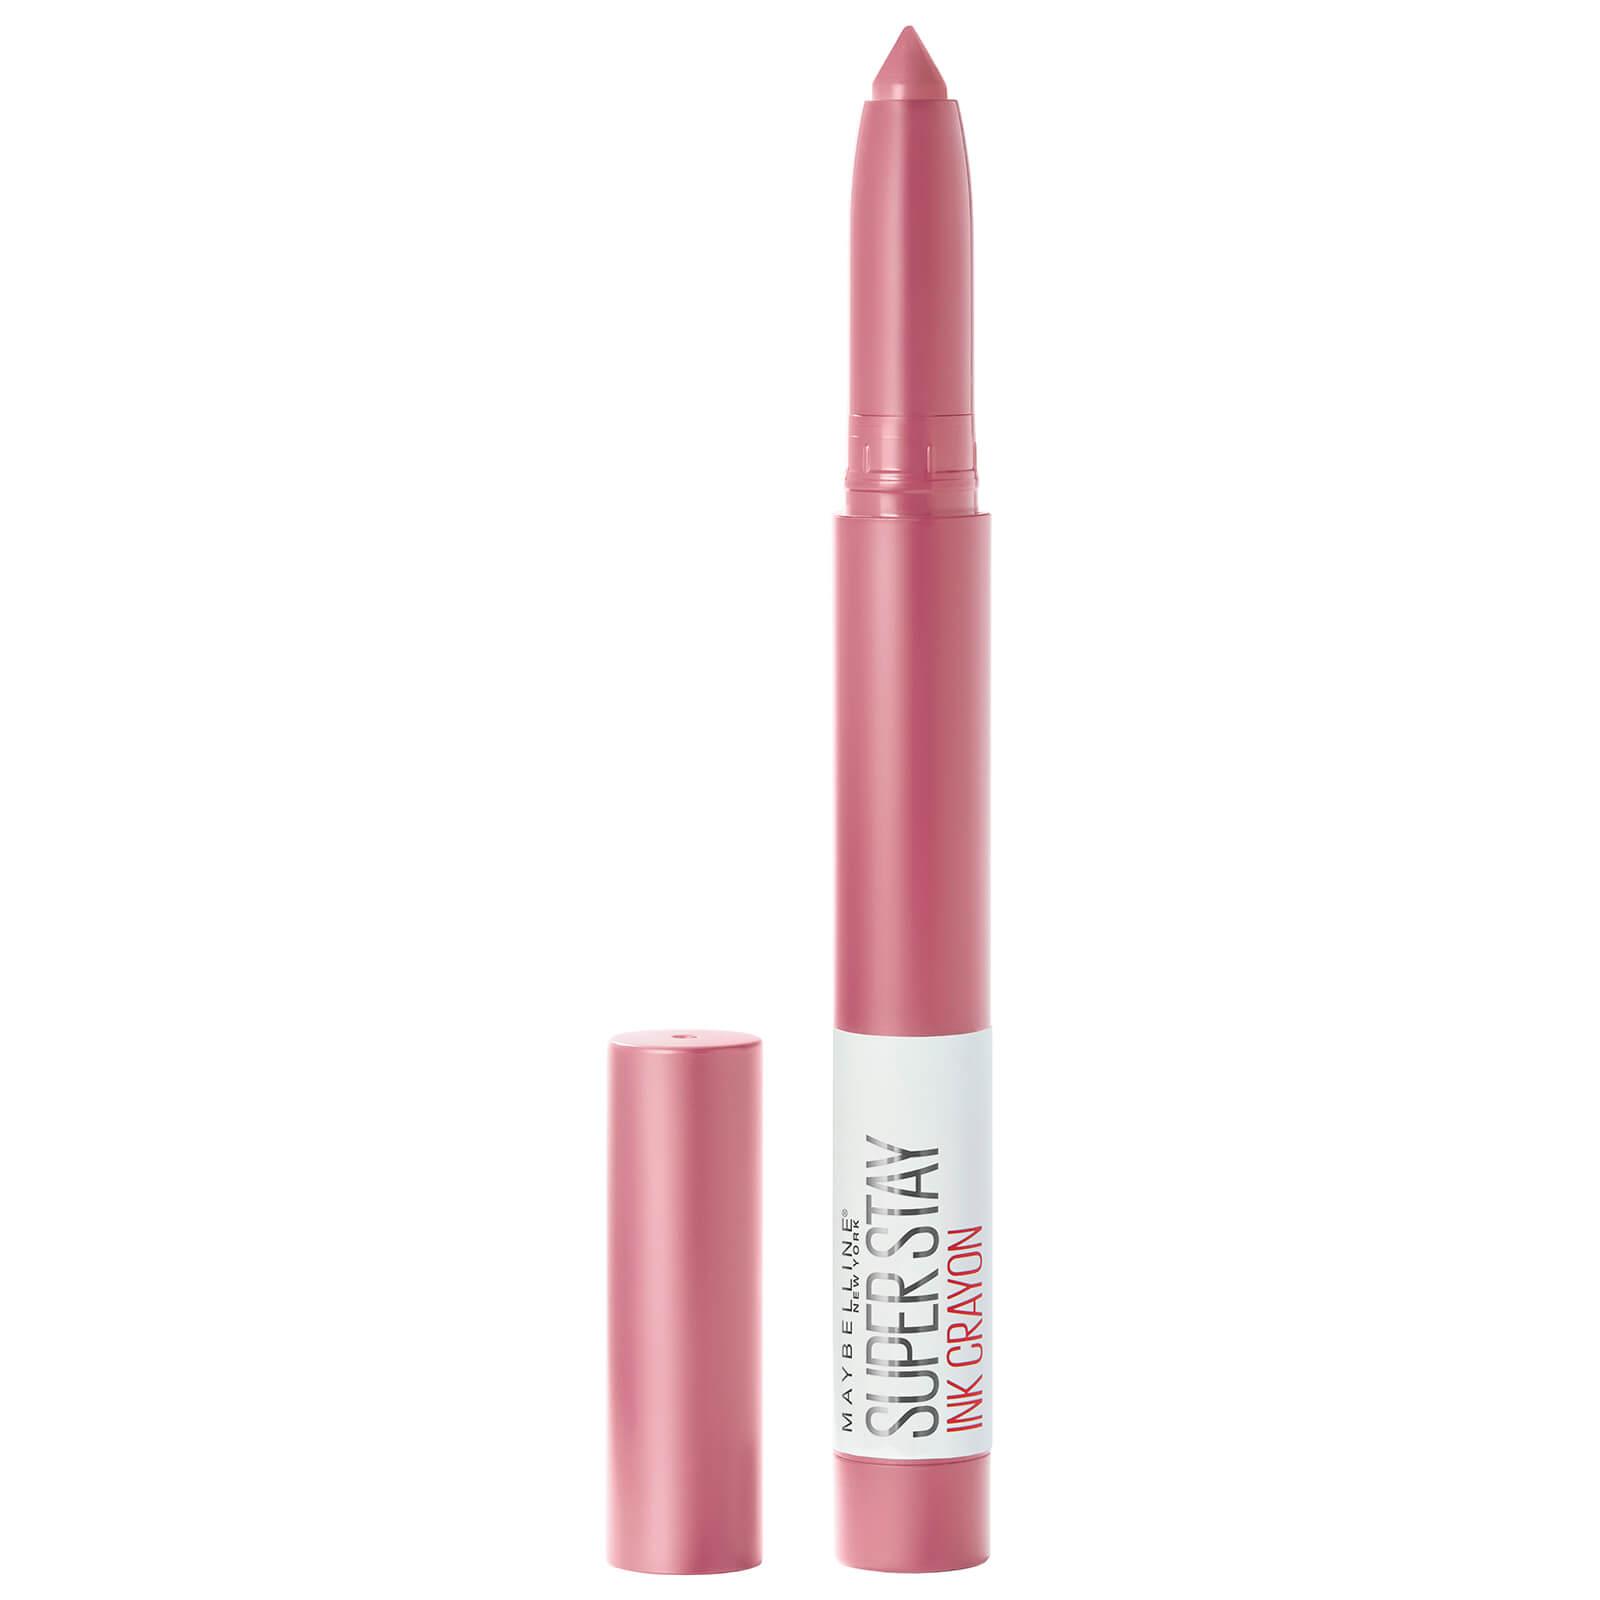 Купить Maybelline Superstay Matte Ink Crayon Lipstick 32g (Various Shades) - 40 Laugh Louder